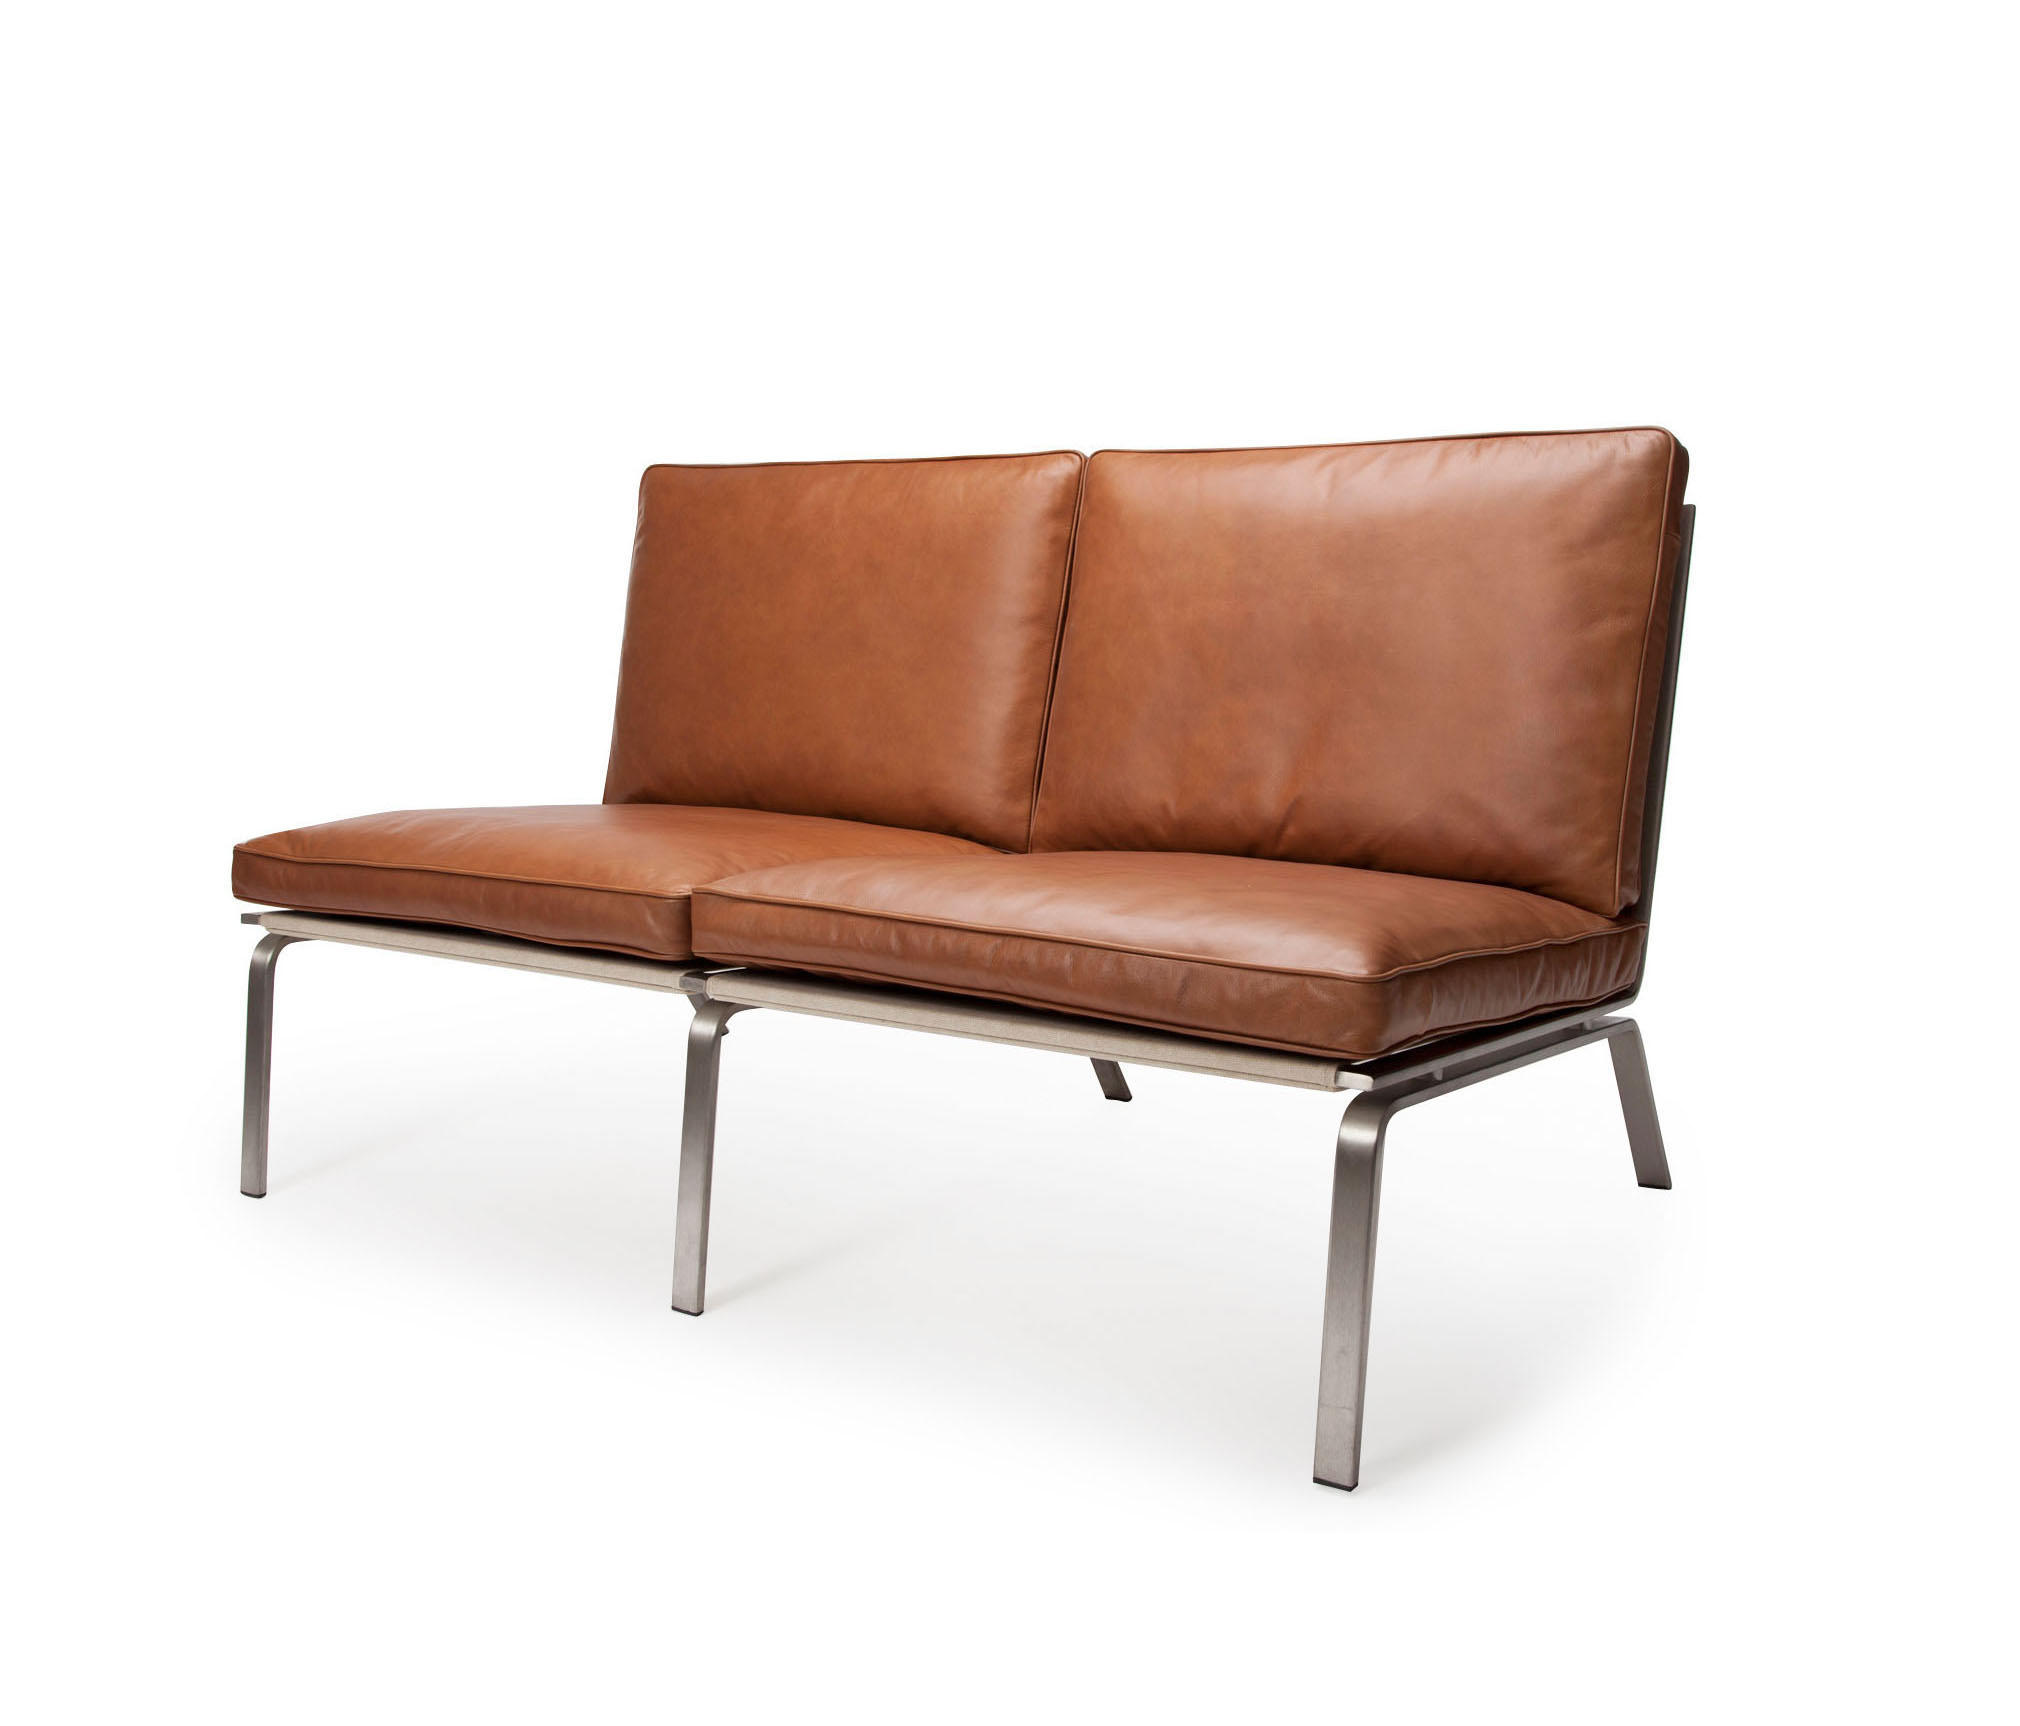 man sofa 2 sitzer loungesofas von norr11 architonic. Black Bedroom Furniture Sets. Home Design Ideas